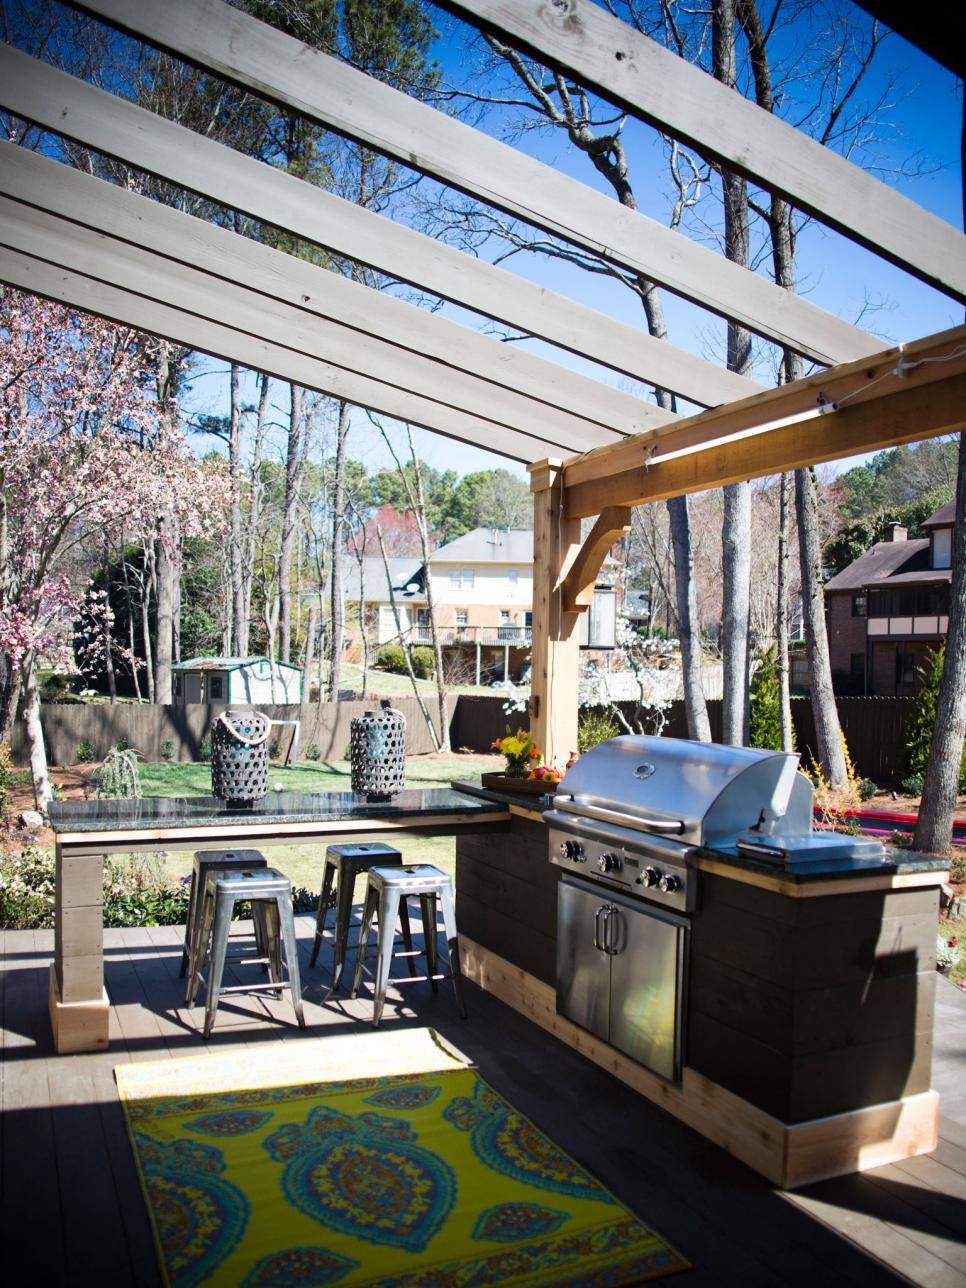 Trendige Ideen für die Outdoor Küche im Garten - Trendomat.com